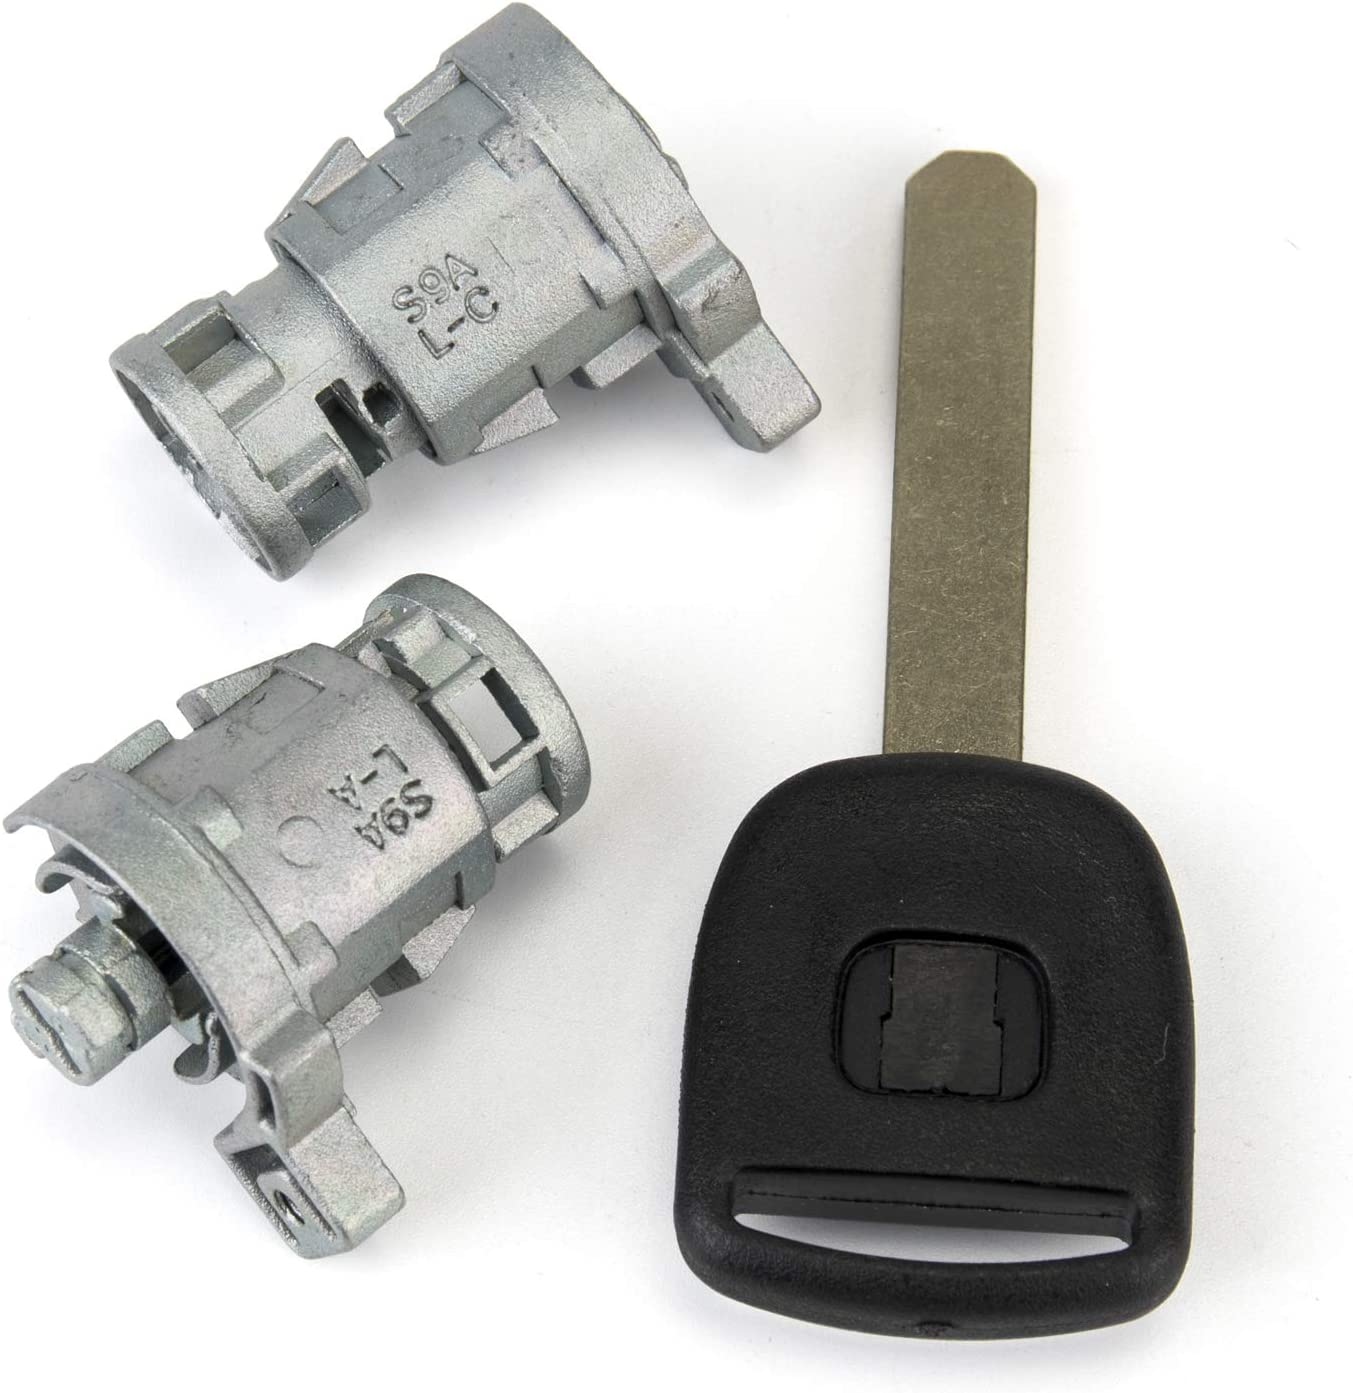 72185-S9A-013 99-04 Odyssey 00-09 S2000 3mirrors L/R Door Lock ...